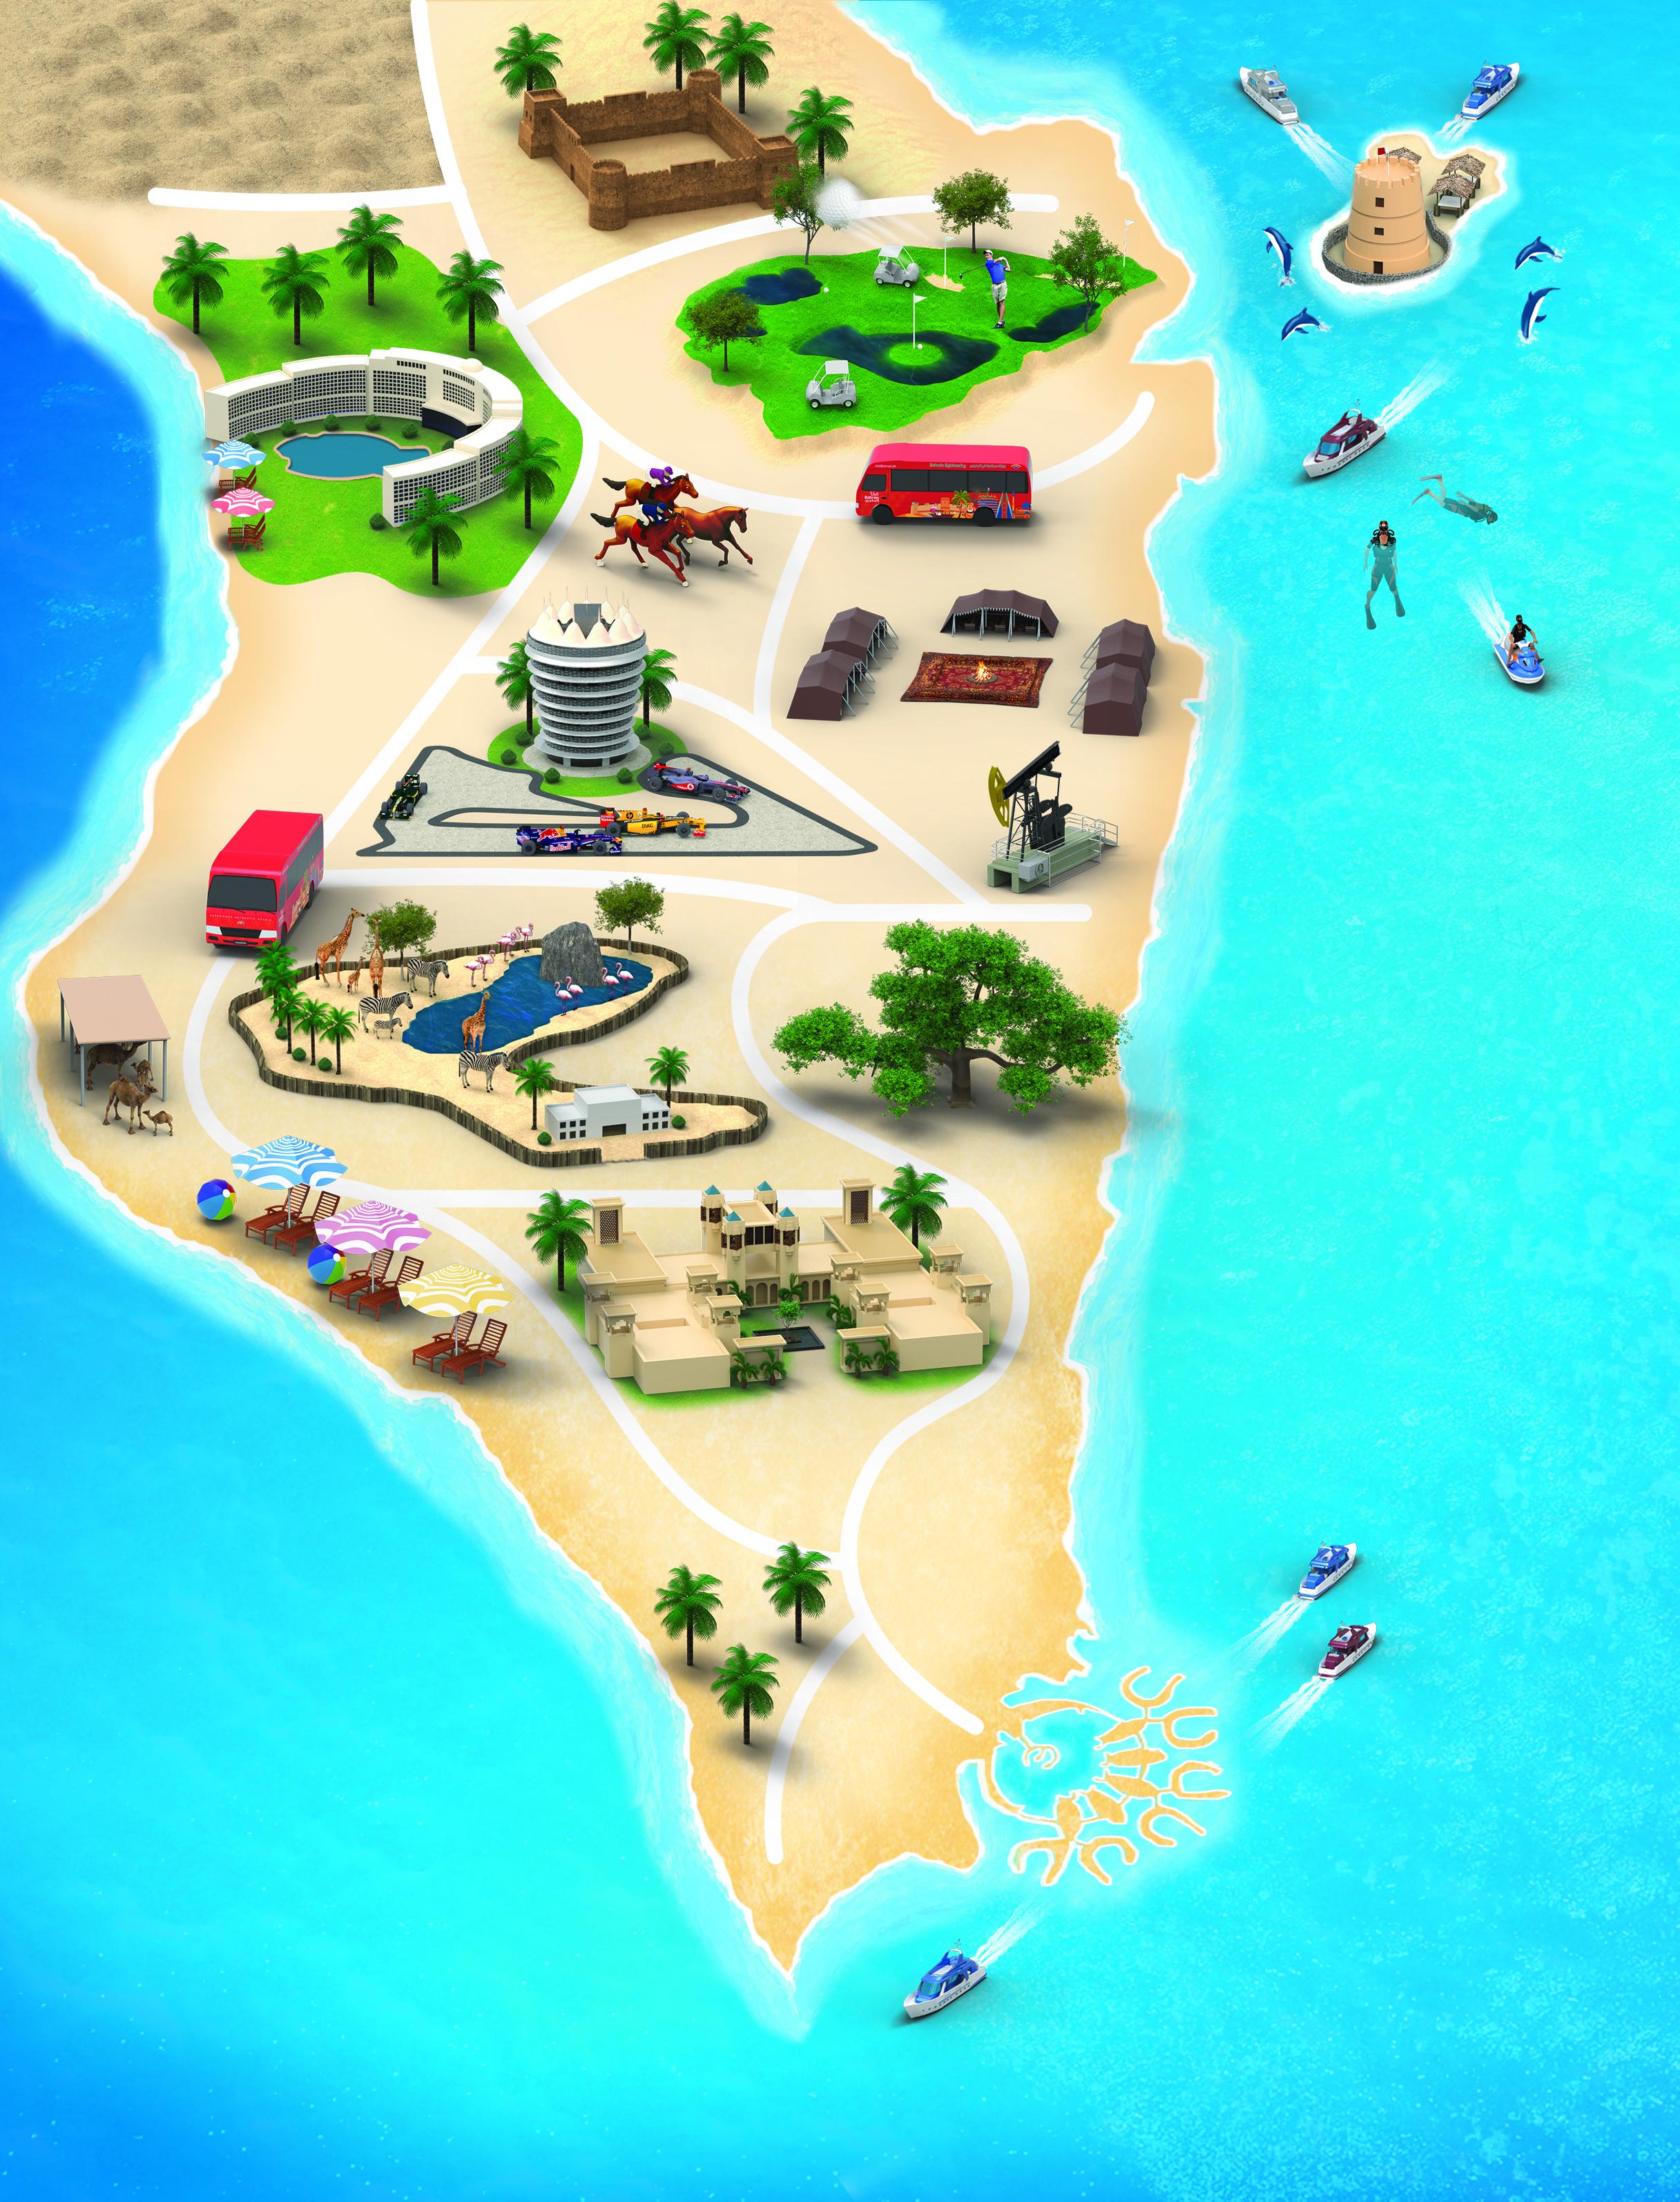 bahrain map image